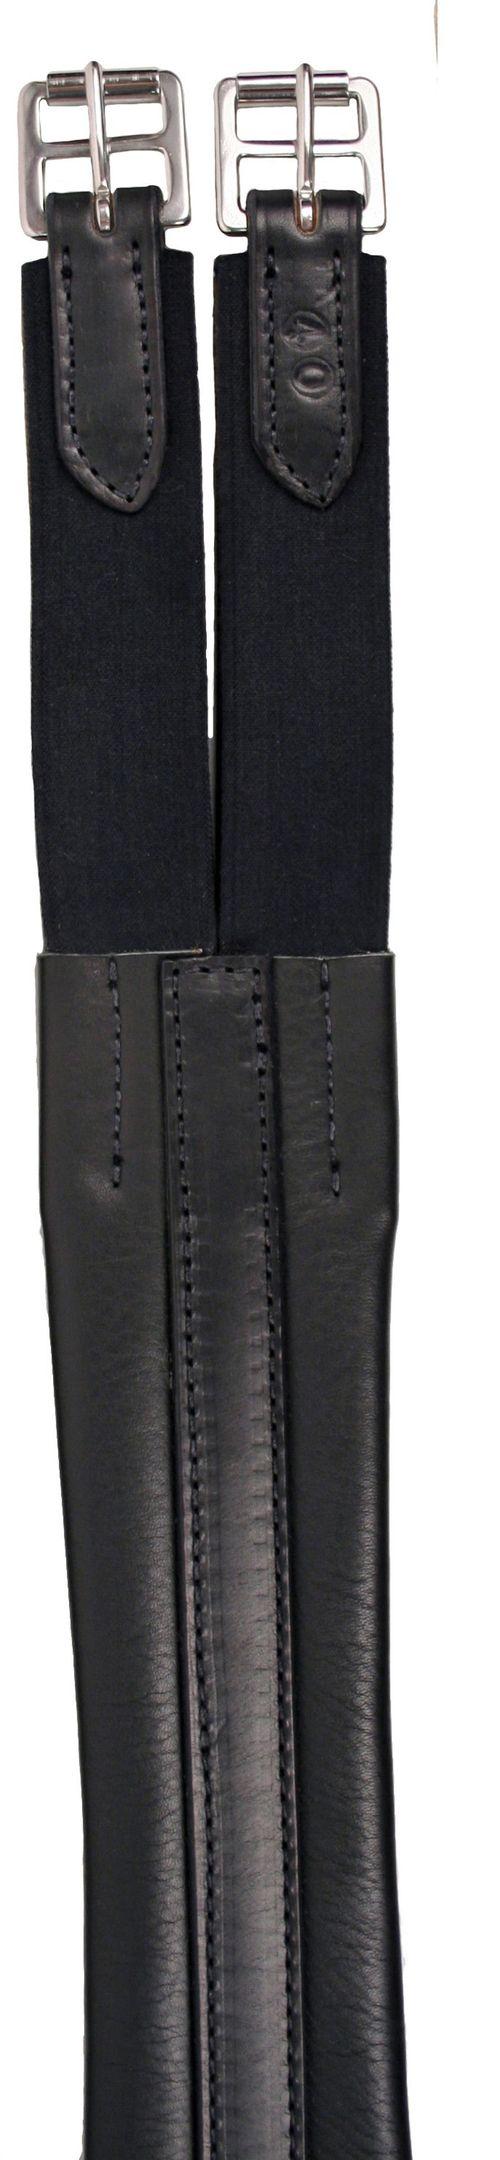 Nunn Finer Contour Elastic Double End Girth - Black